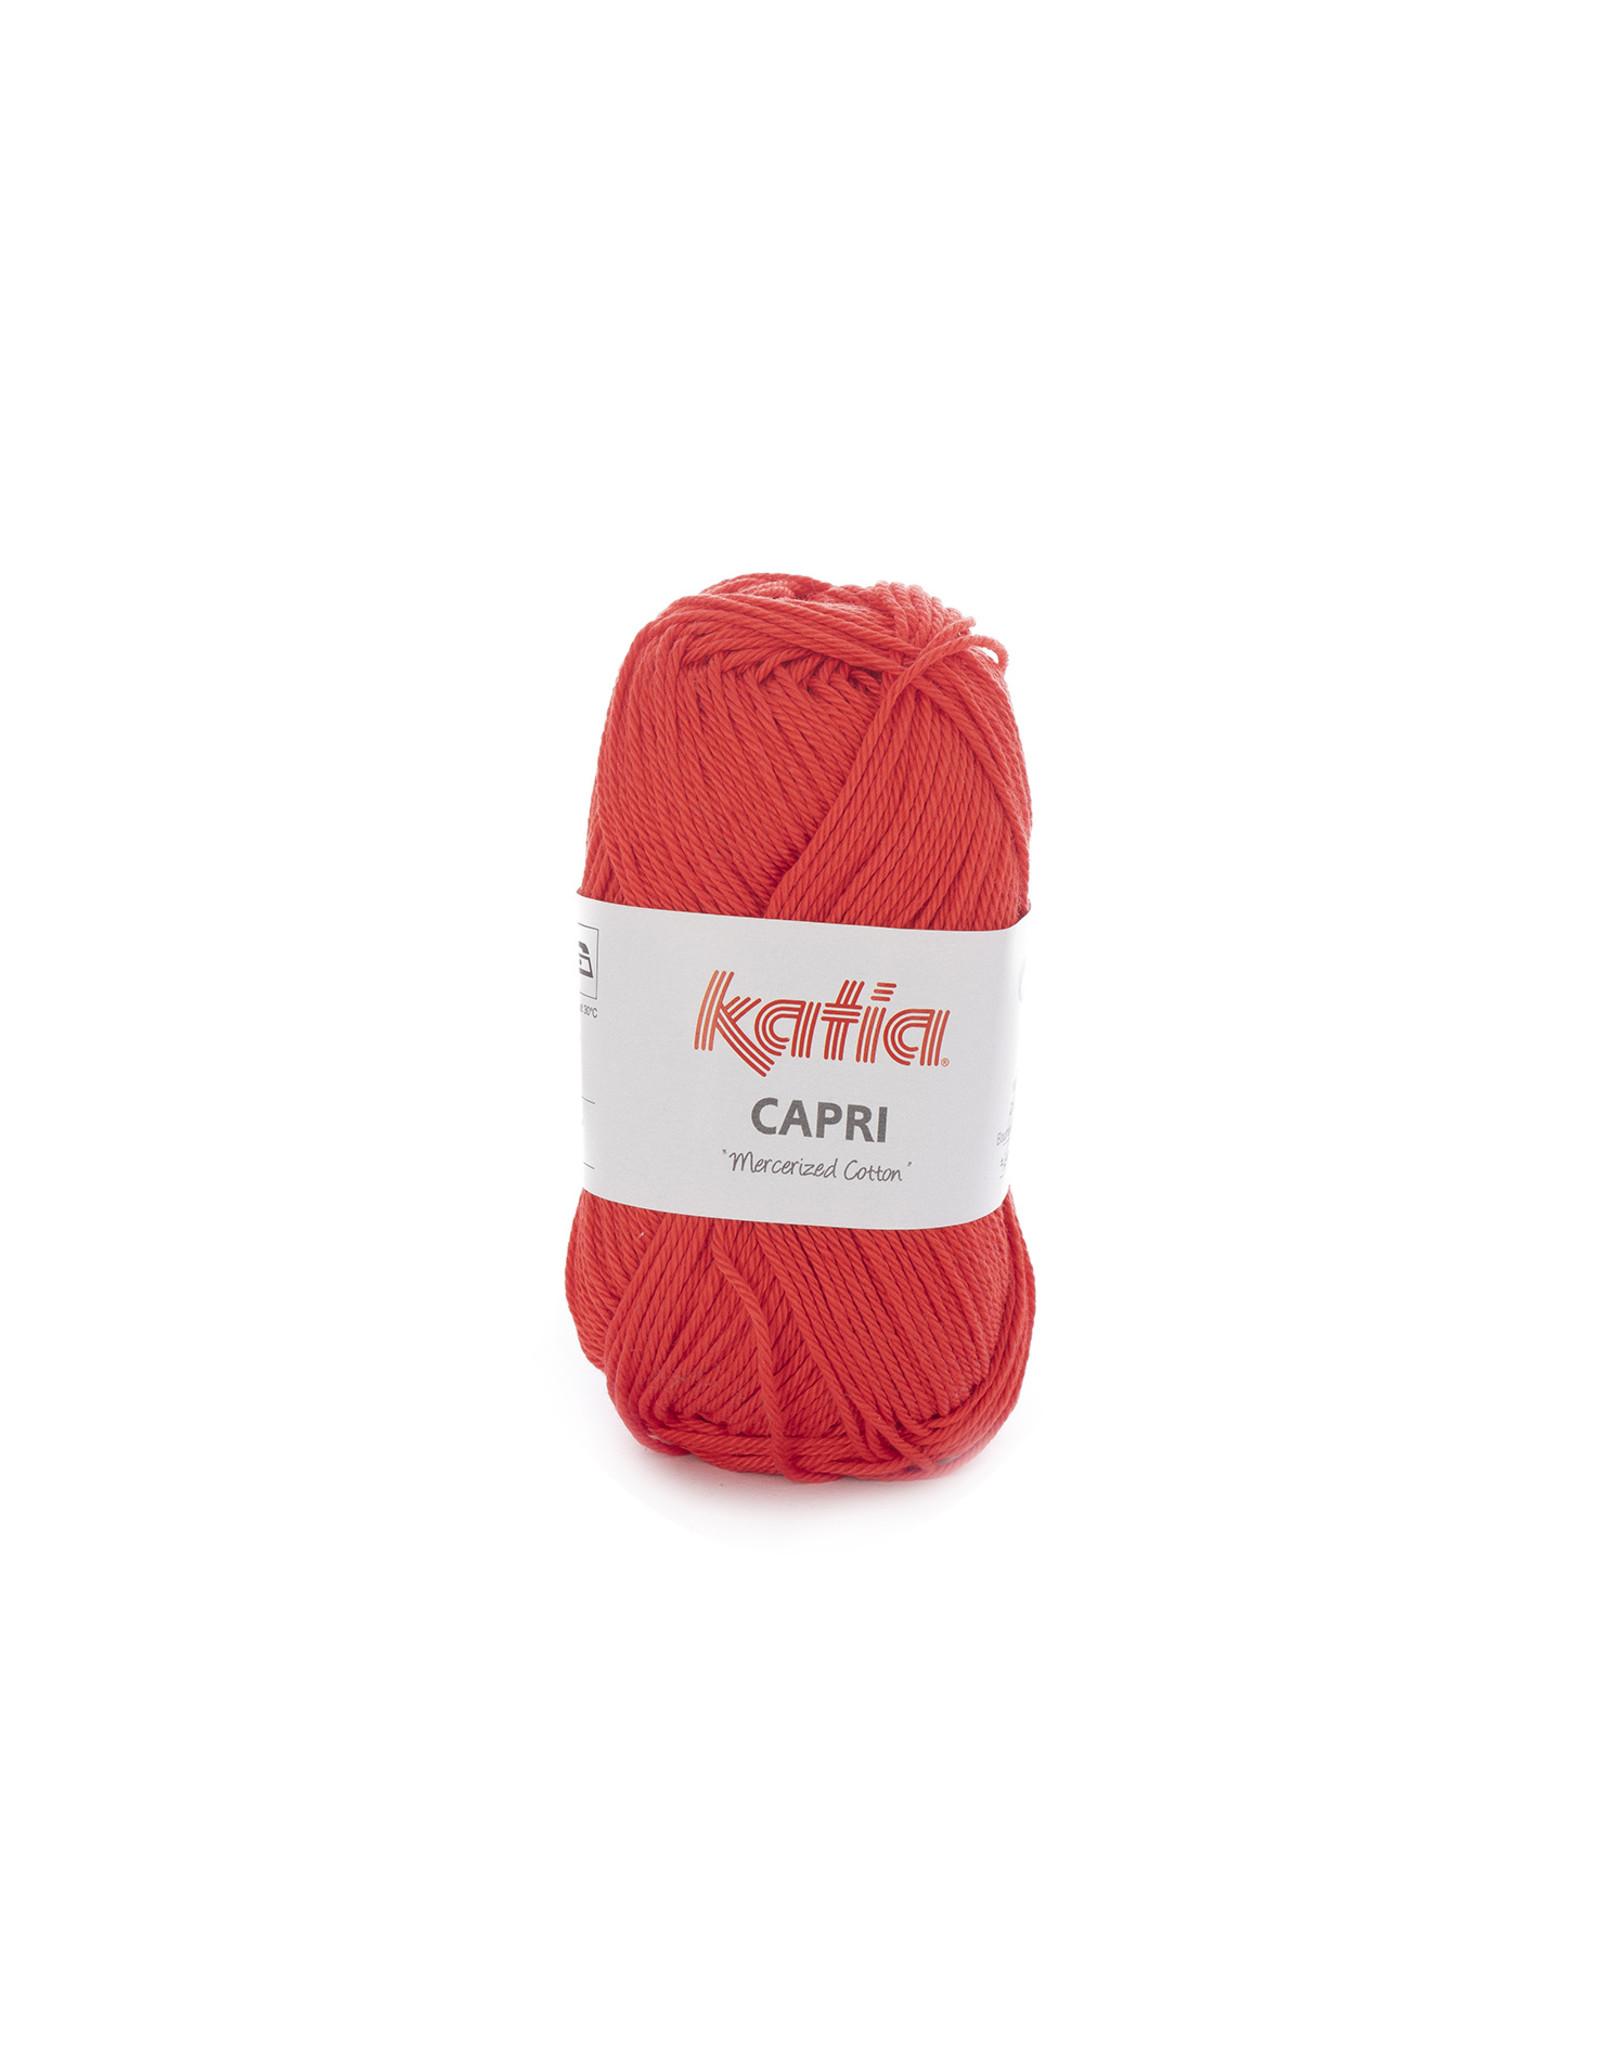 Katia Katia Capri - kleur 164 Koraal - 50 gr. = 125 m. - 100% katoen